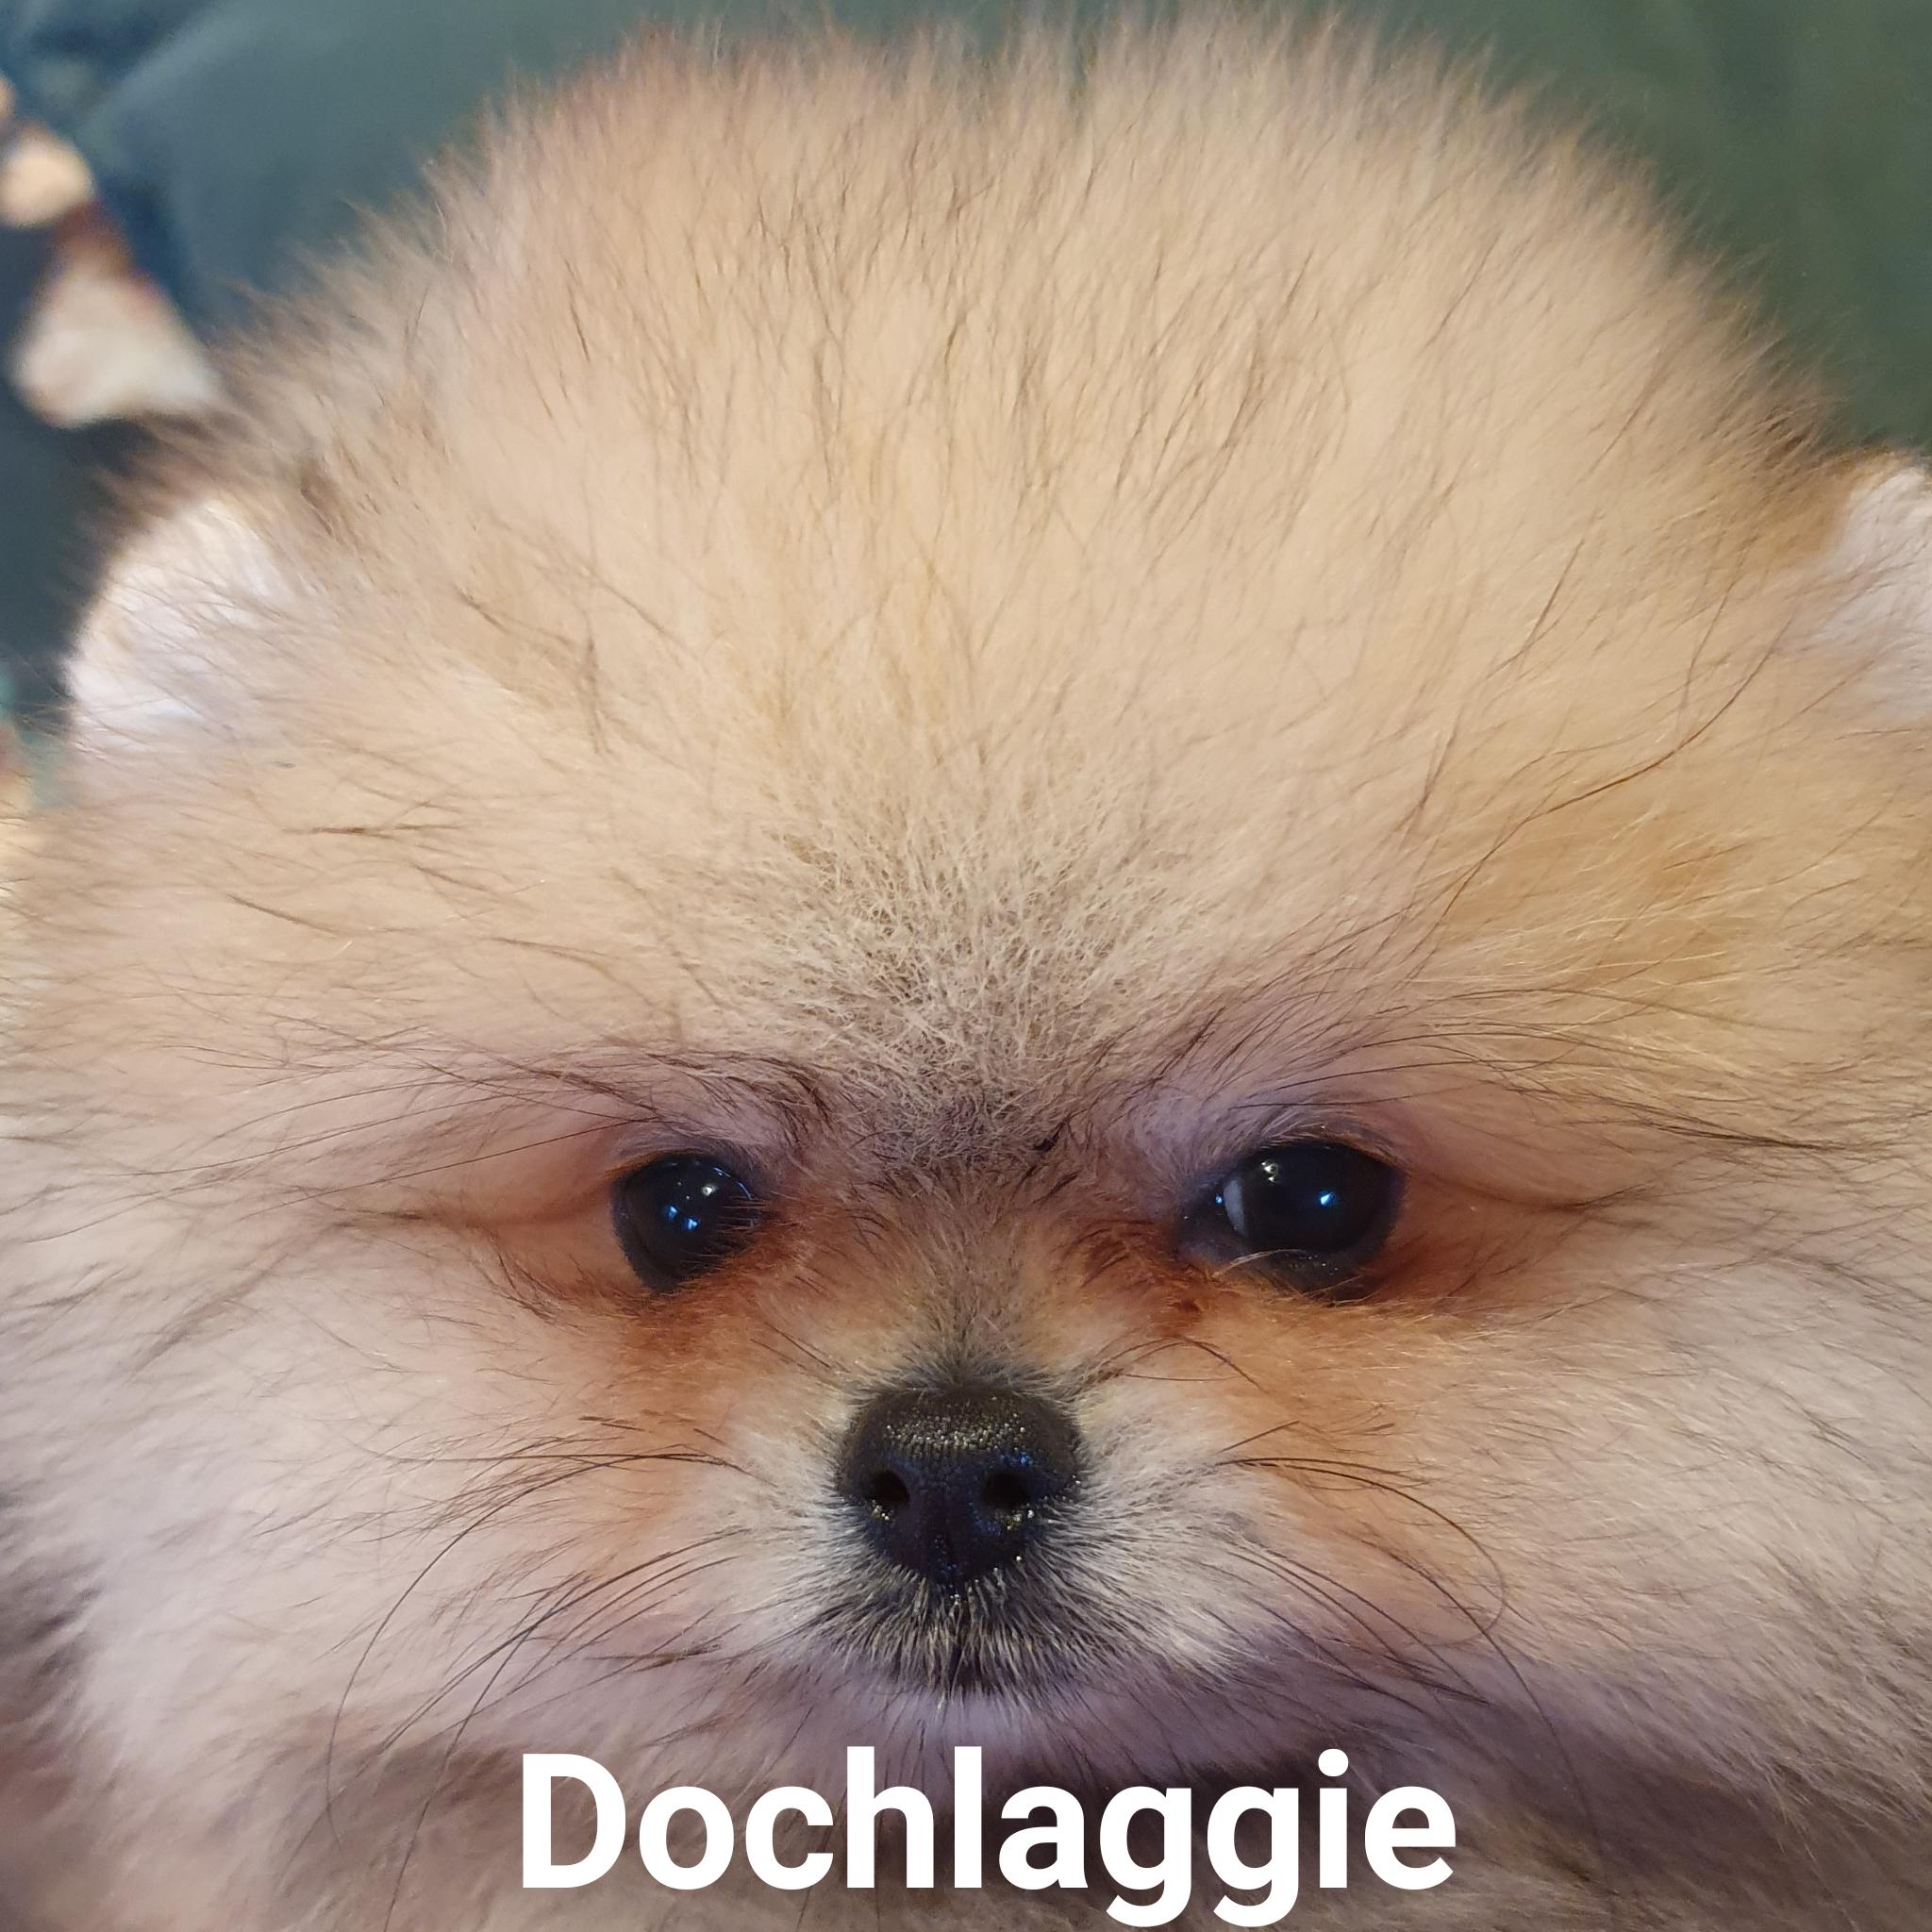 Dochlaggie Pomeranian Puppies Melbourne Dochlaggie Dochlaggiepomeranians Pomeranians Pomeranian Pomeraniandog Cute Puppies Puppies West Highland Terrier